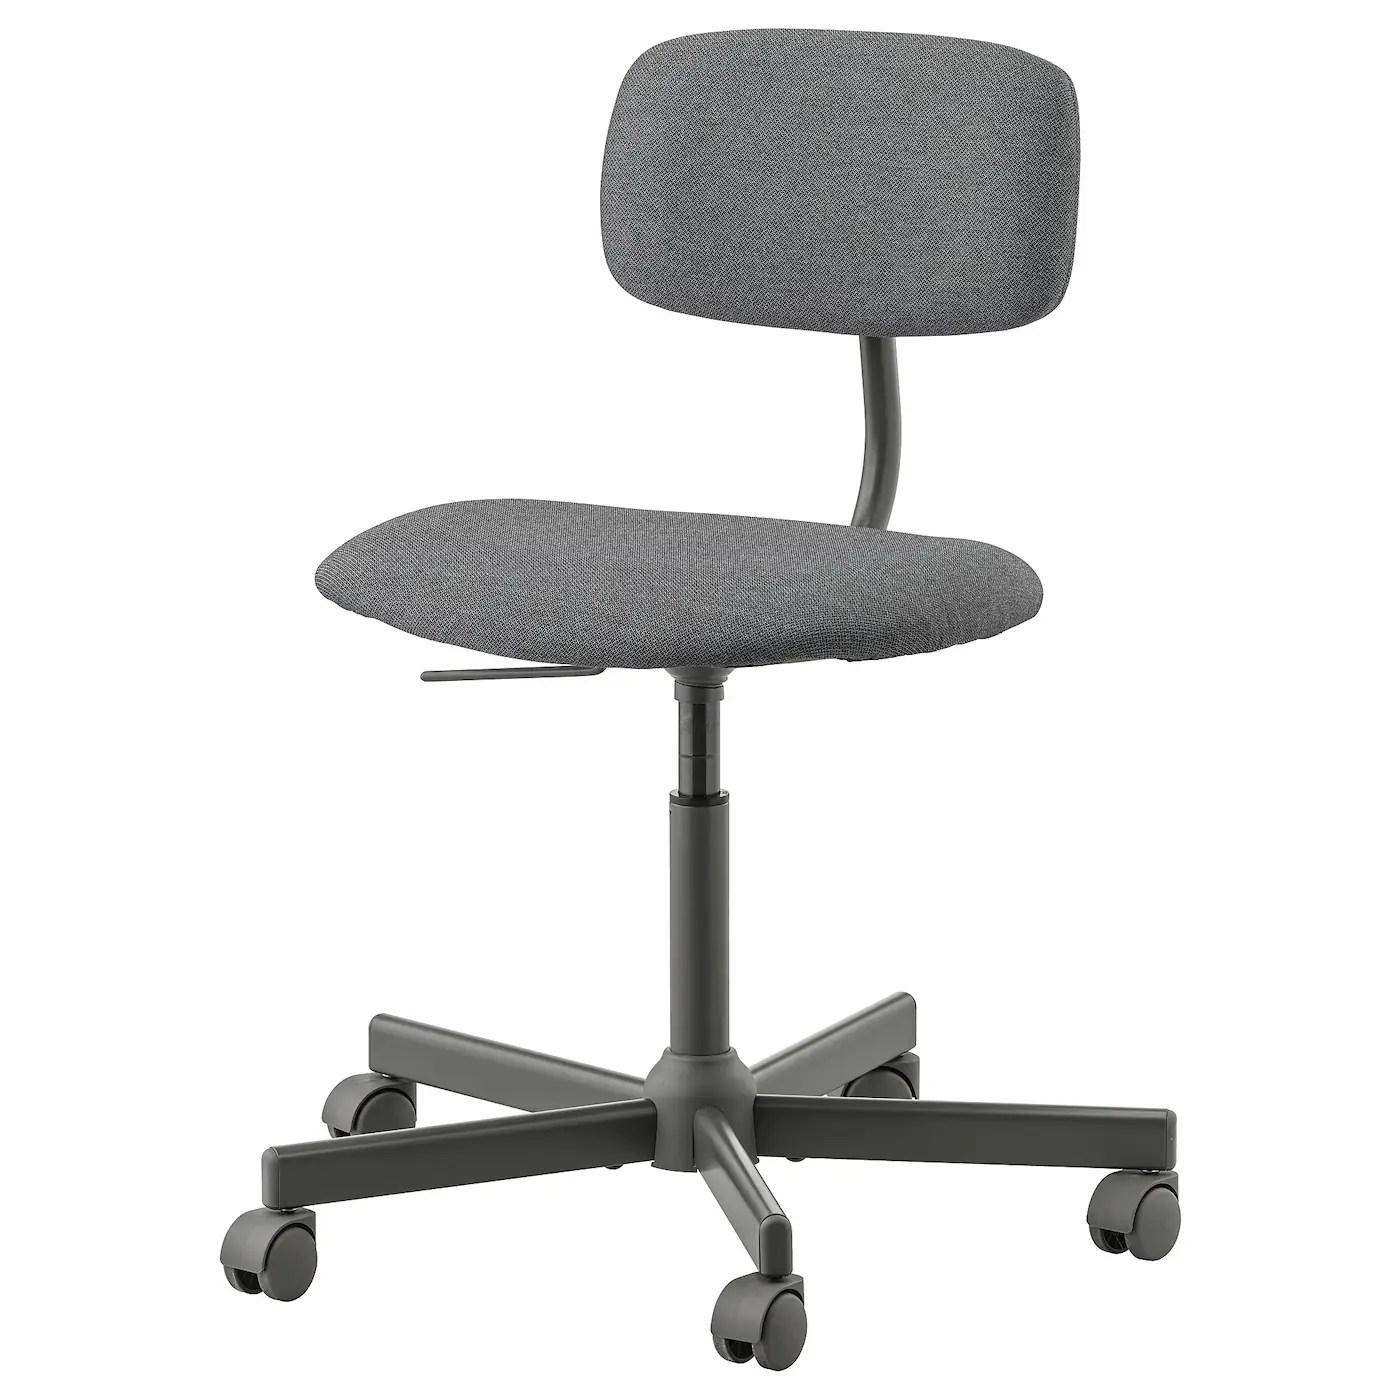 Bleckberget Idekulla Dark Grey Swivel Chair Ikea